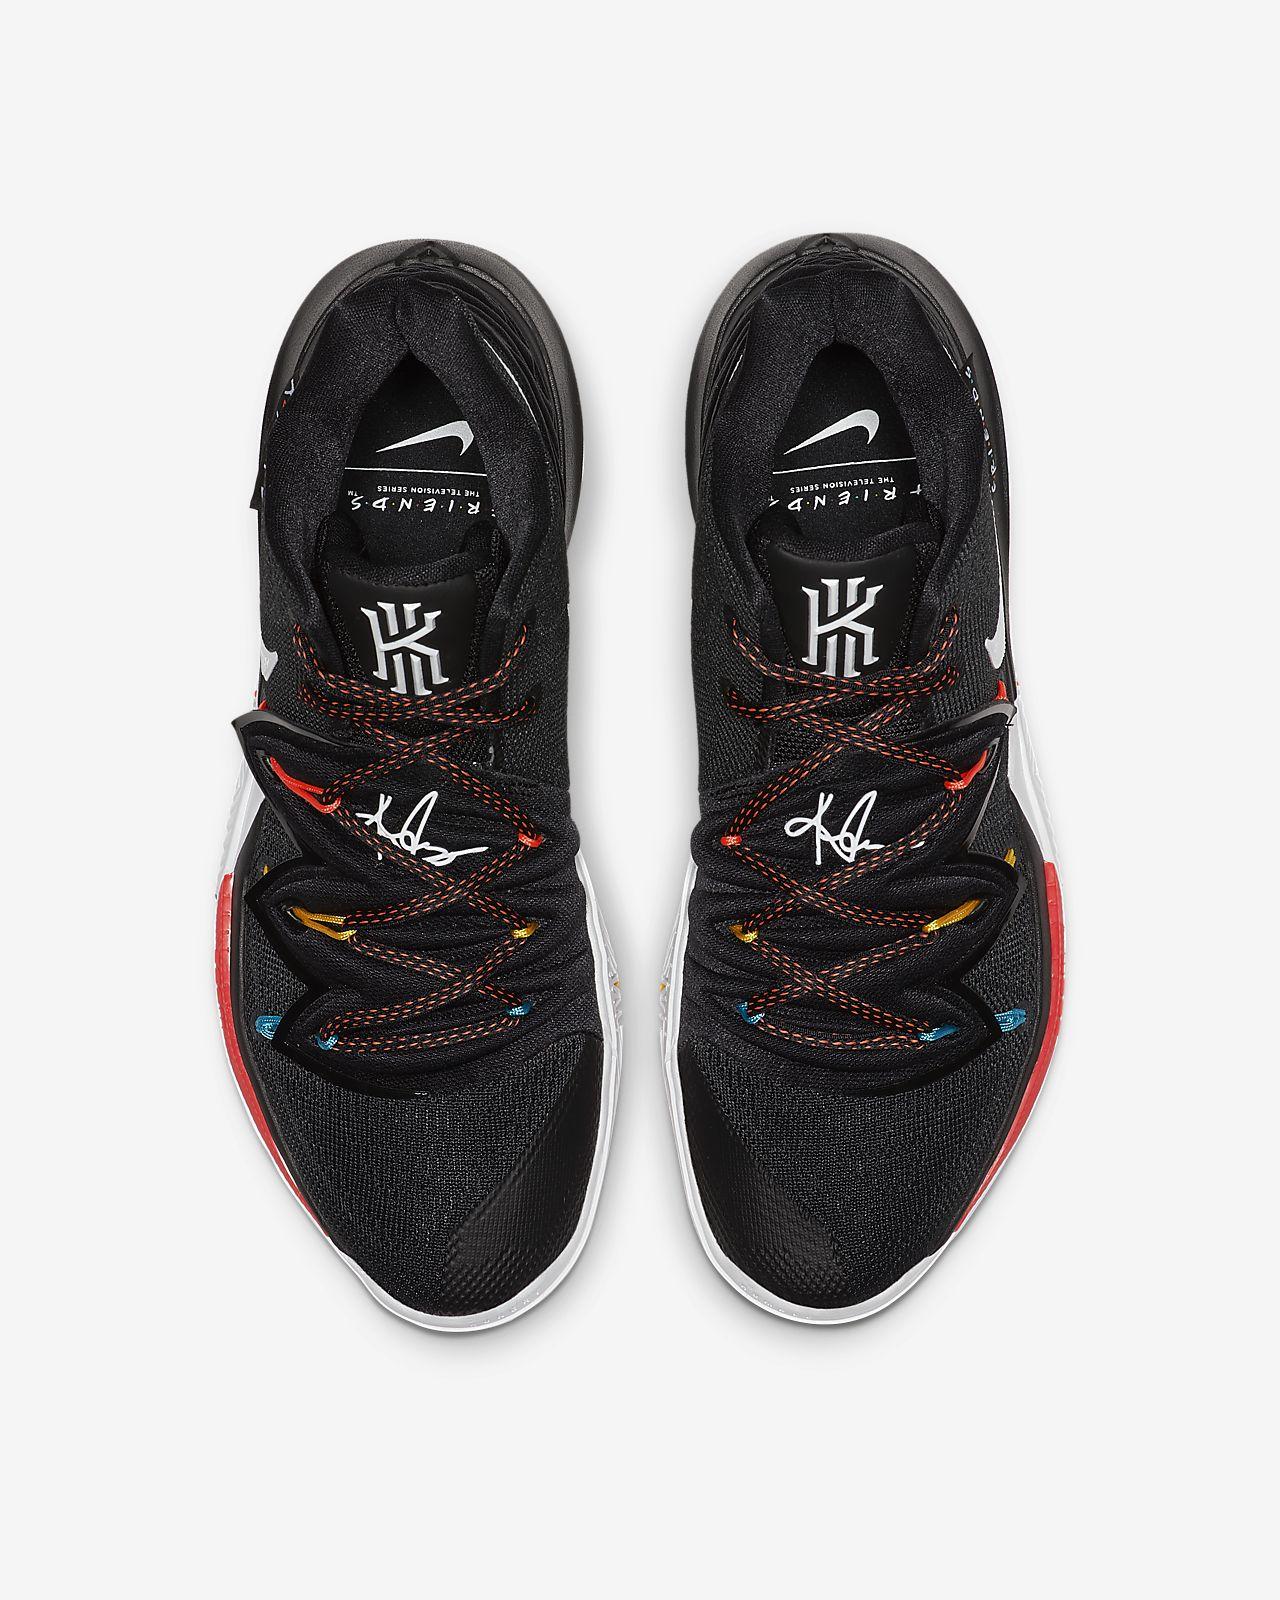 15345b9196345c Kyrie 5 x Friends Men s Basketball Shoe. Nike.com